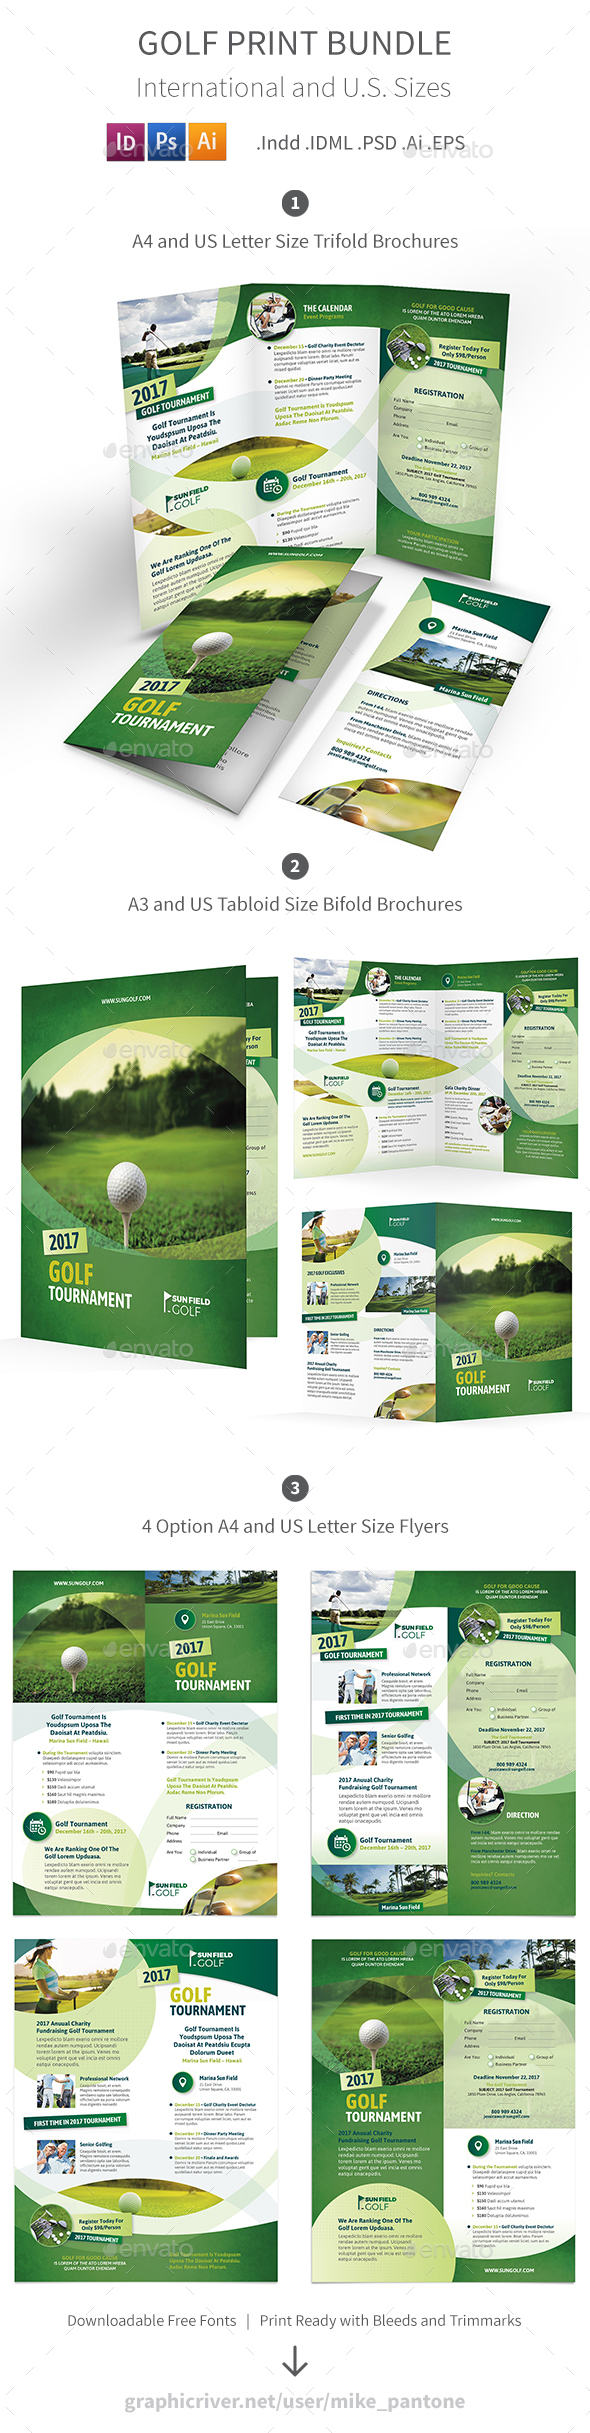 GraphicRiver Golf Print Bundle 7 20870514